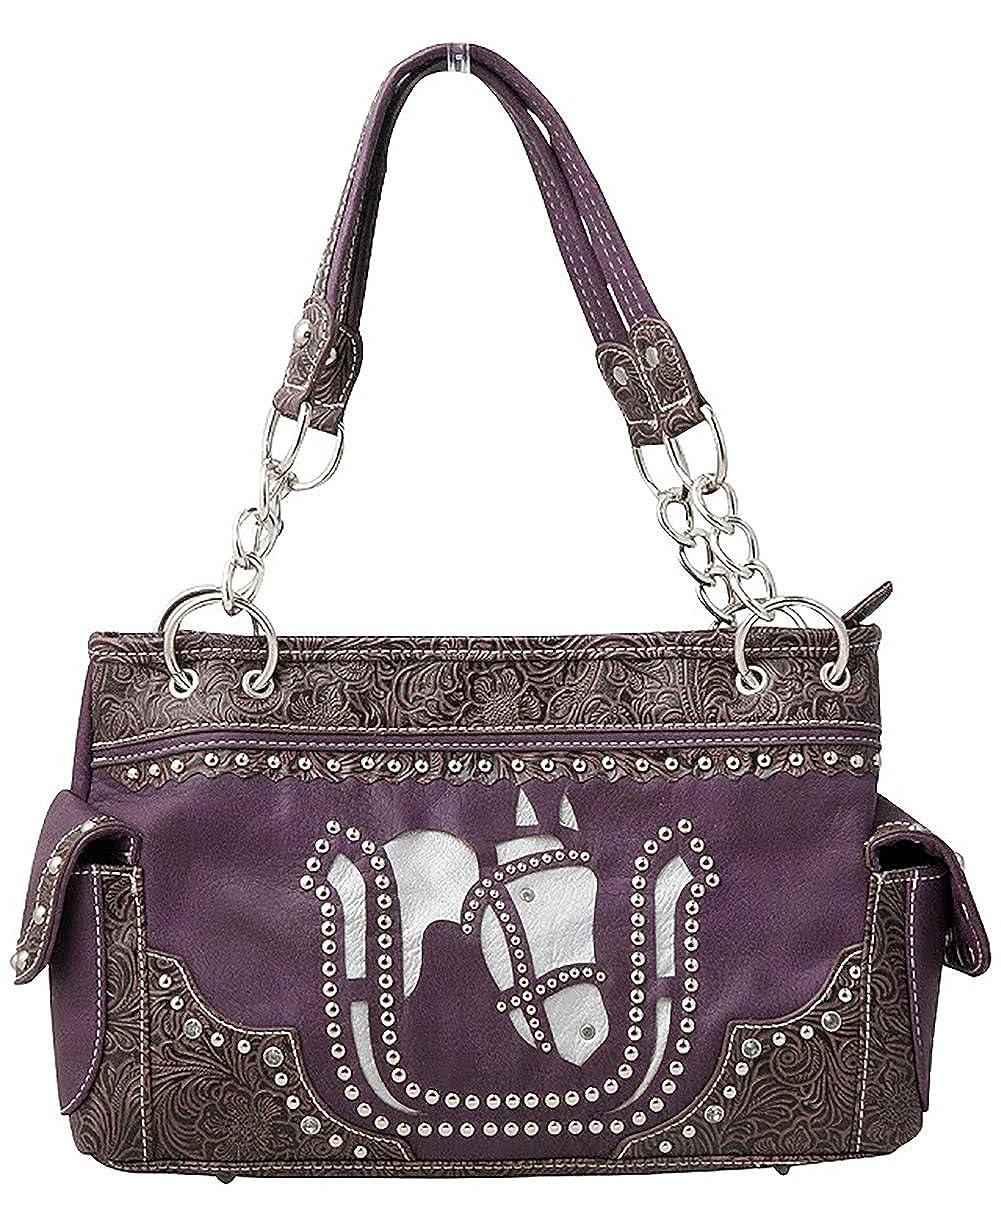 028f5f0cf7 Western White Horse Laser Cut Cowgirl Equestrian Handbag Shoulder Purse  Purple  Handbags  Amazon.com